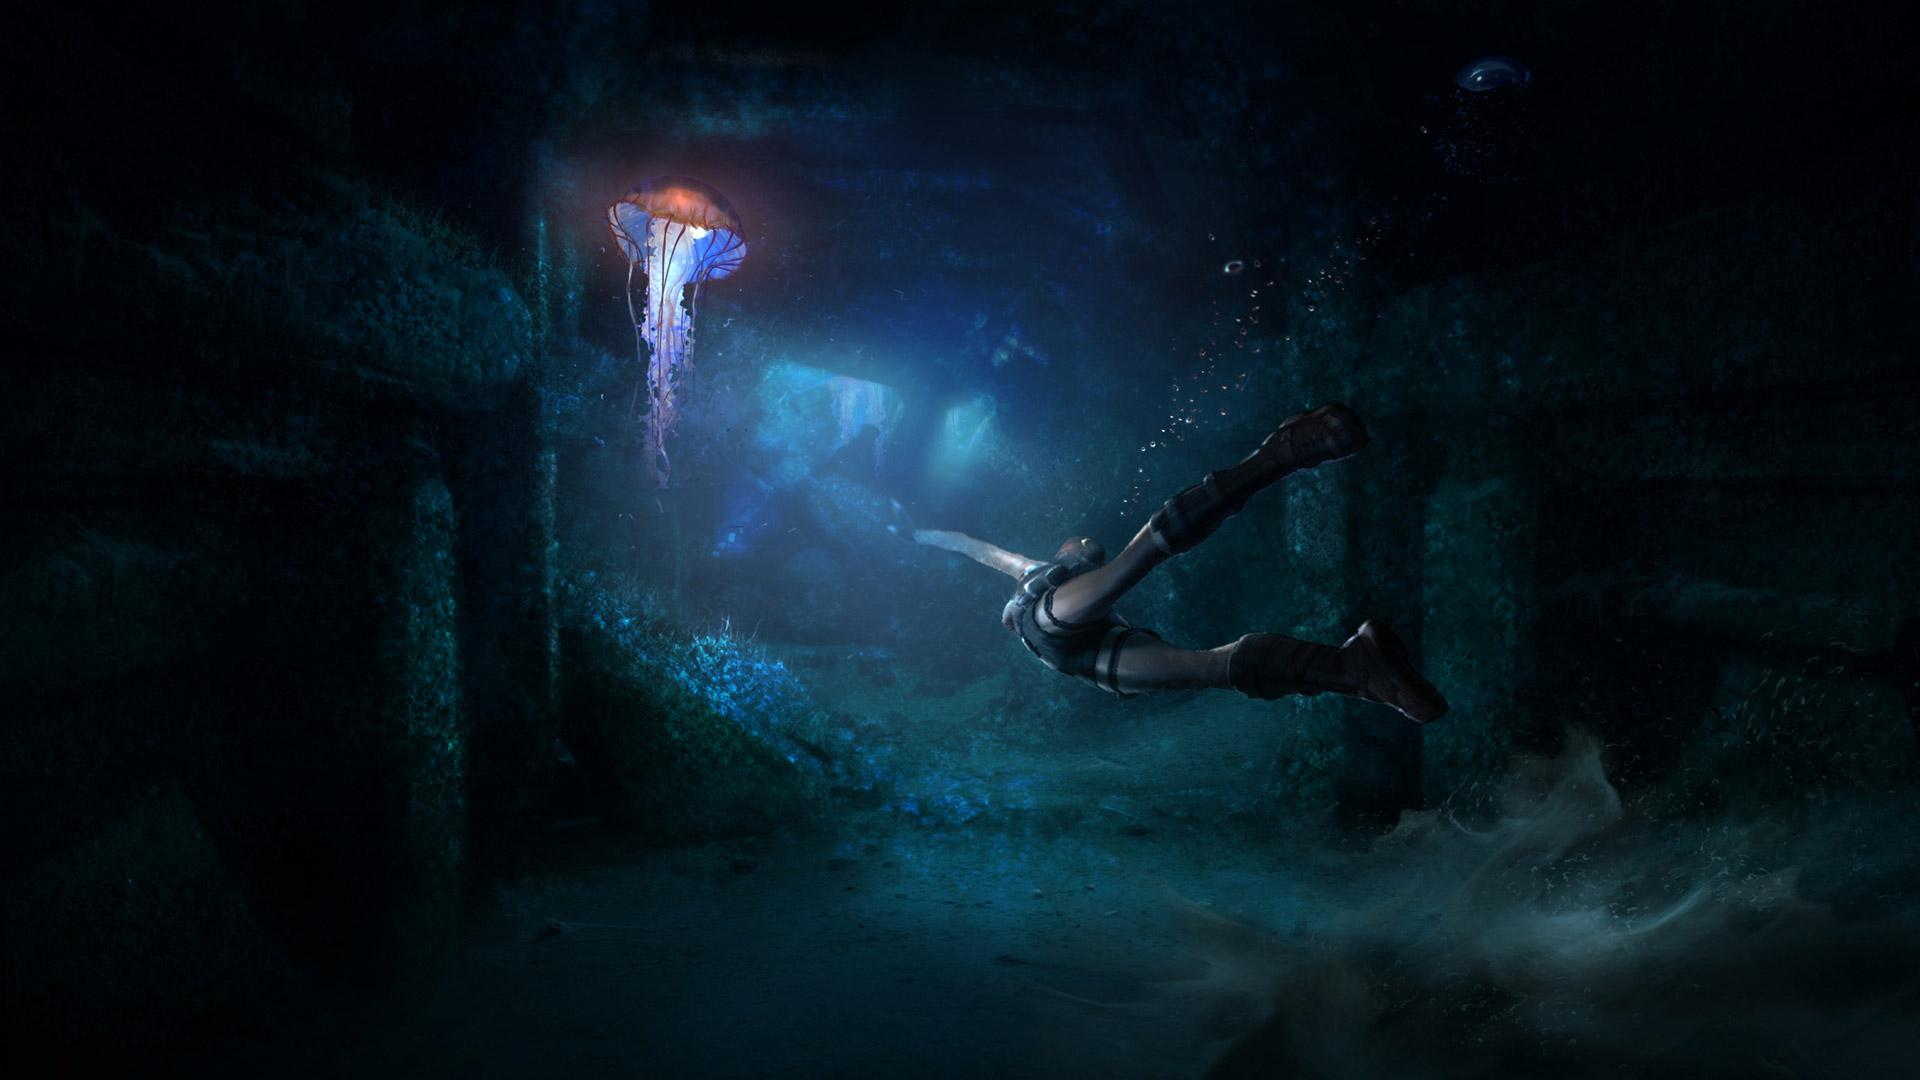 Tomb Raider Underworld wallpaper 4